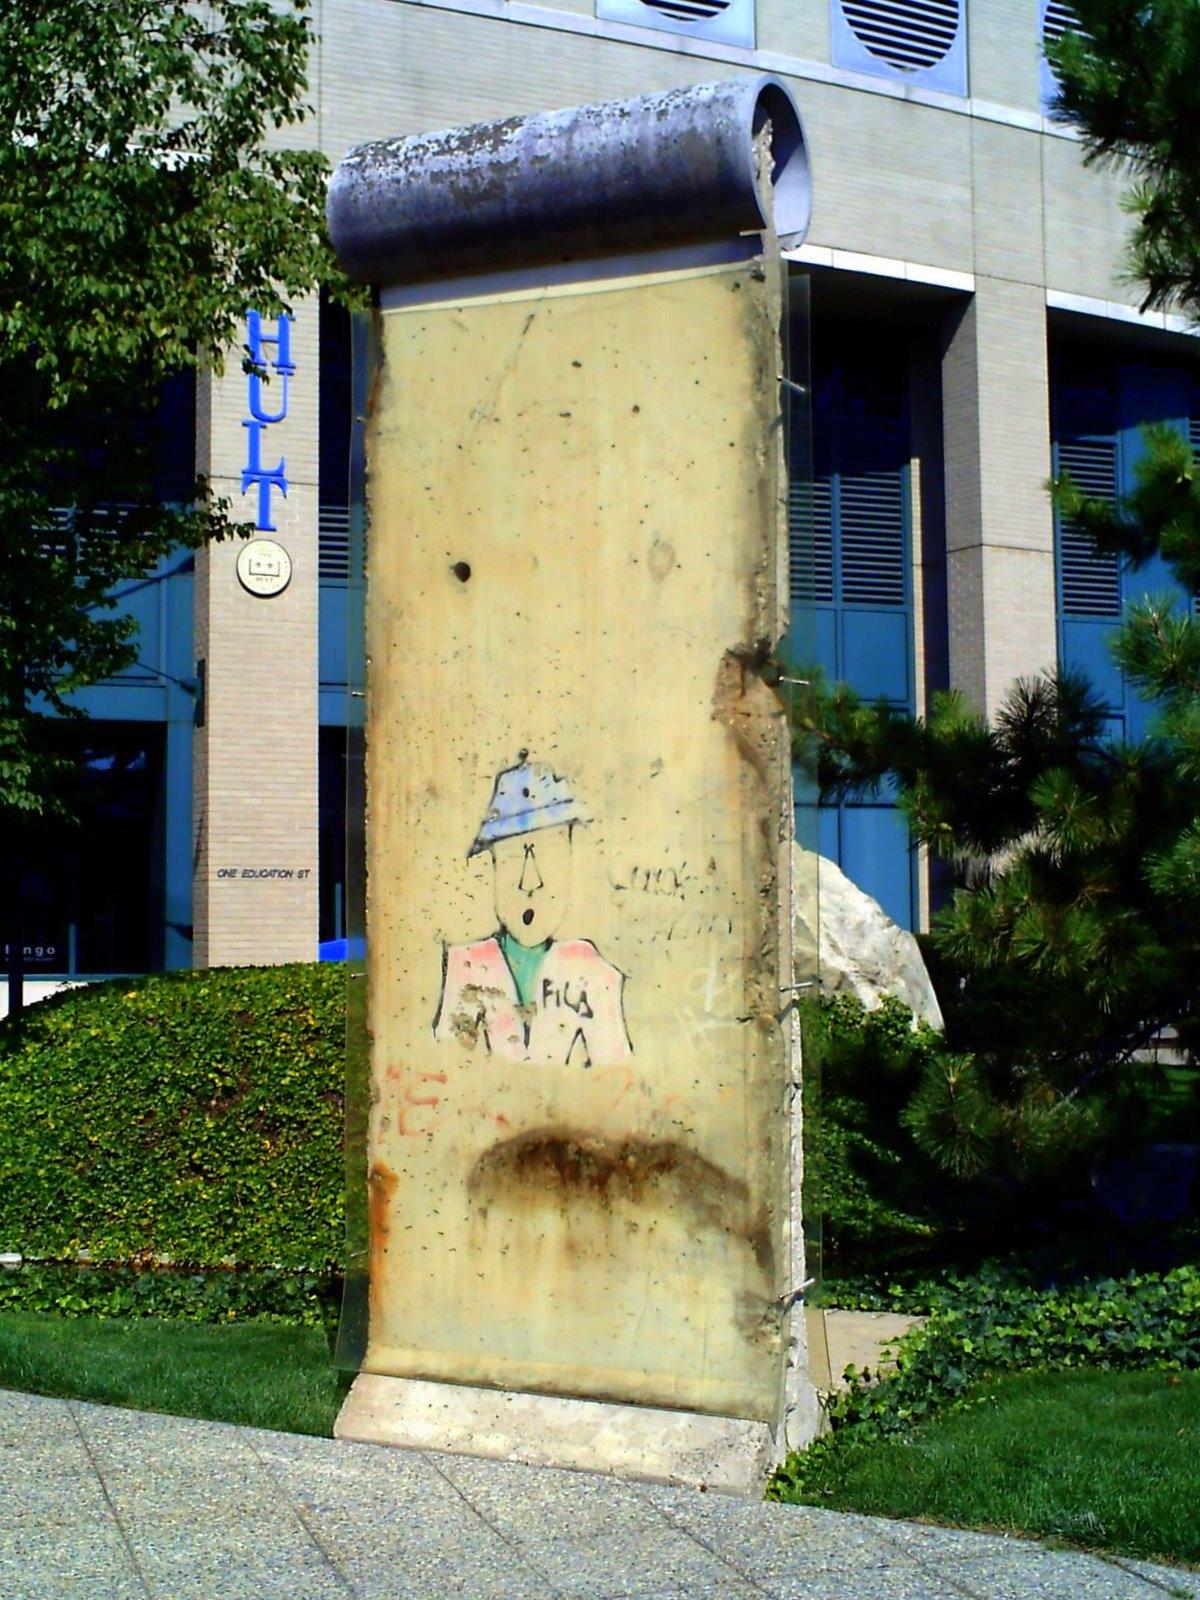 berlin wall, segment, ef education, cambridge, shadow